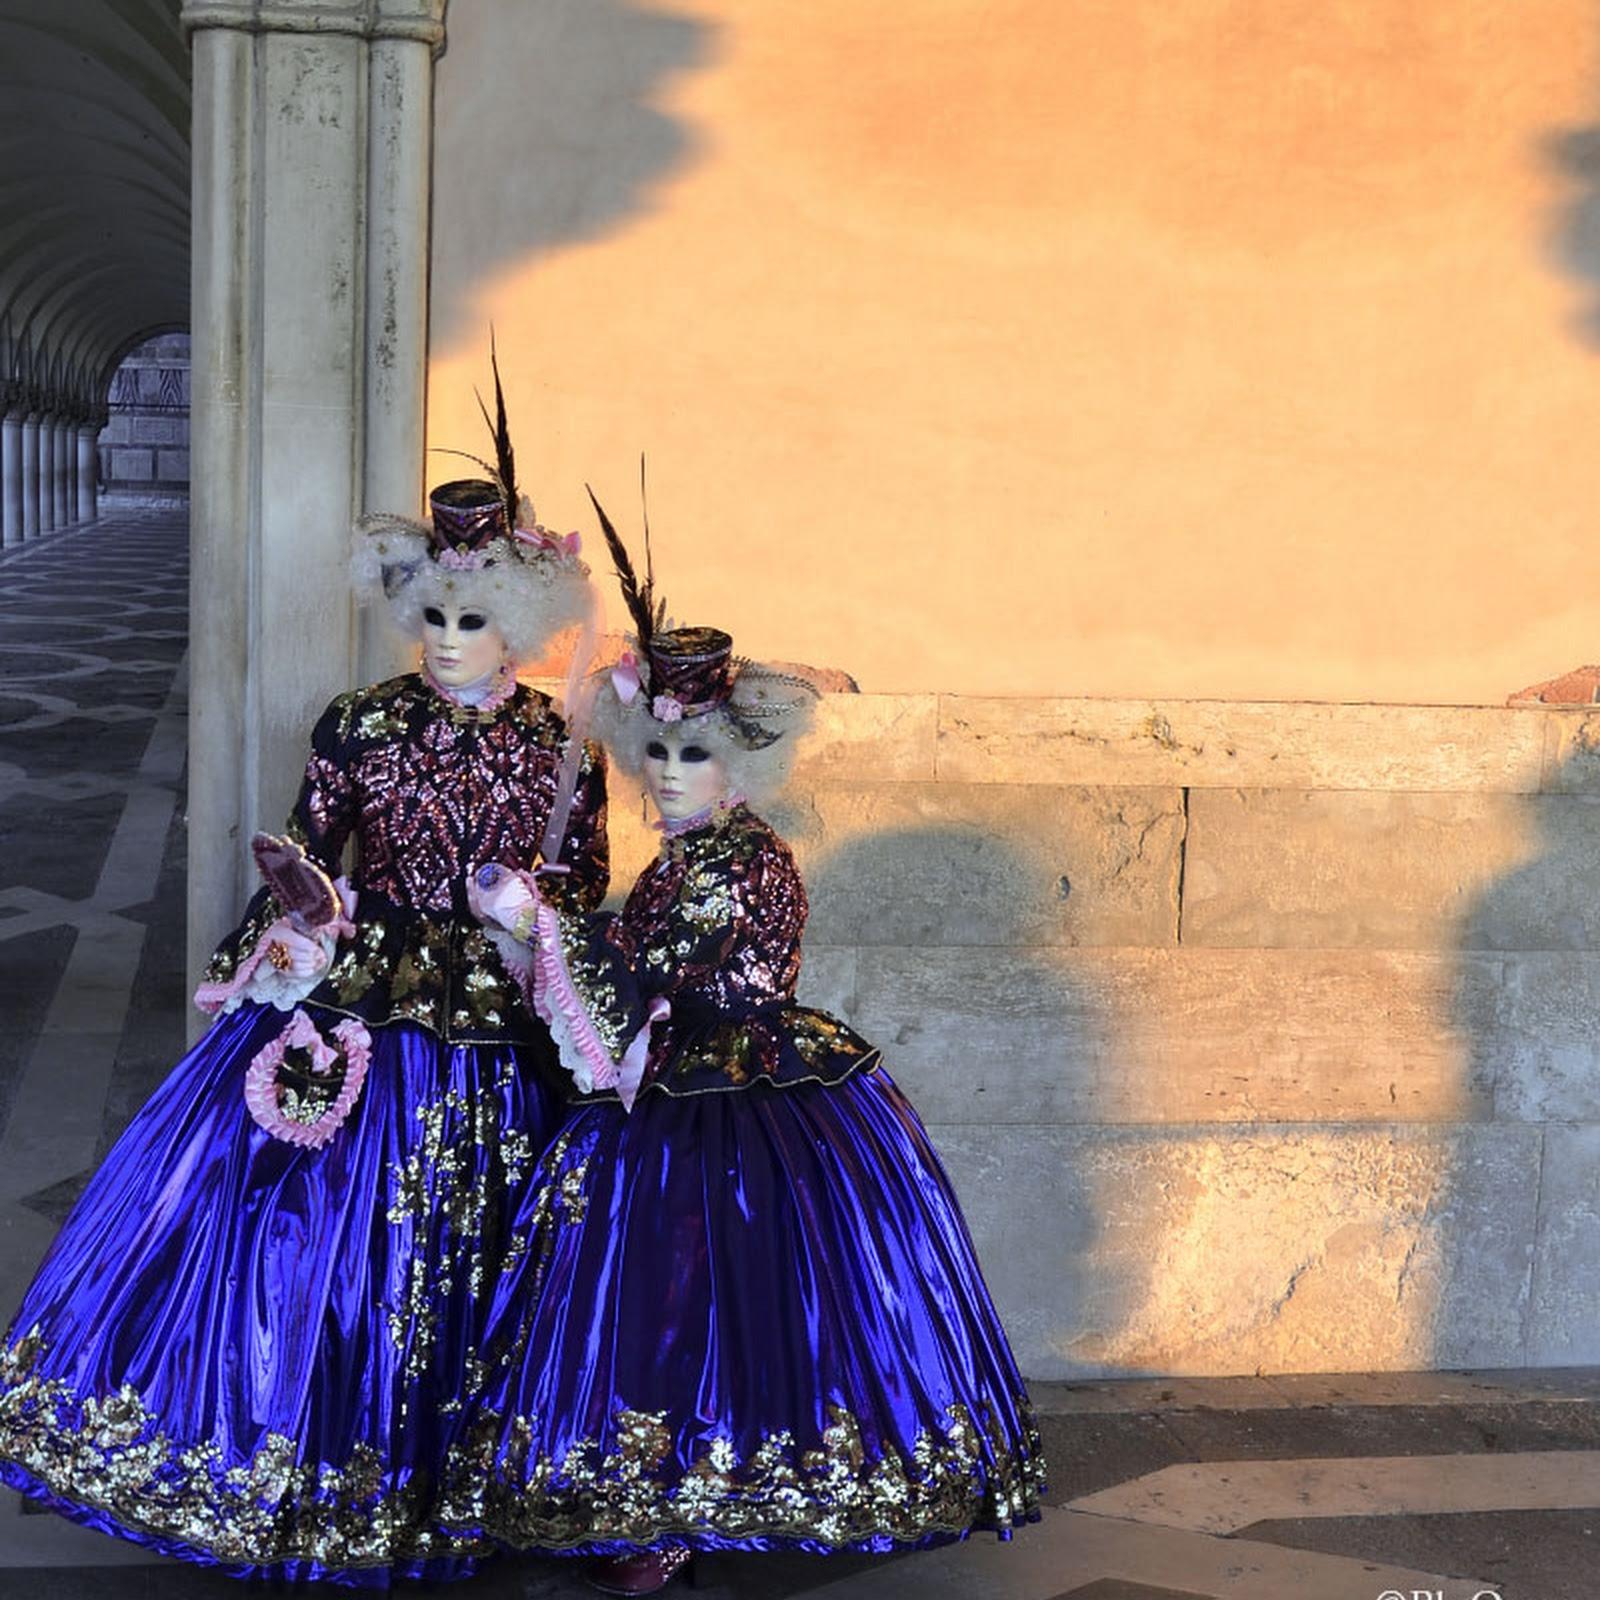 venezia blog: August 2013